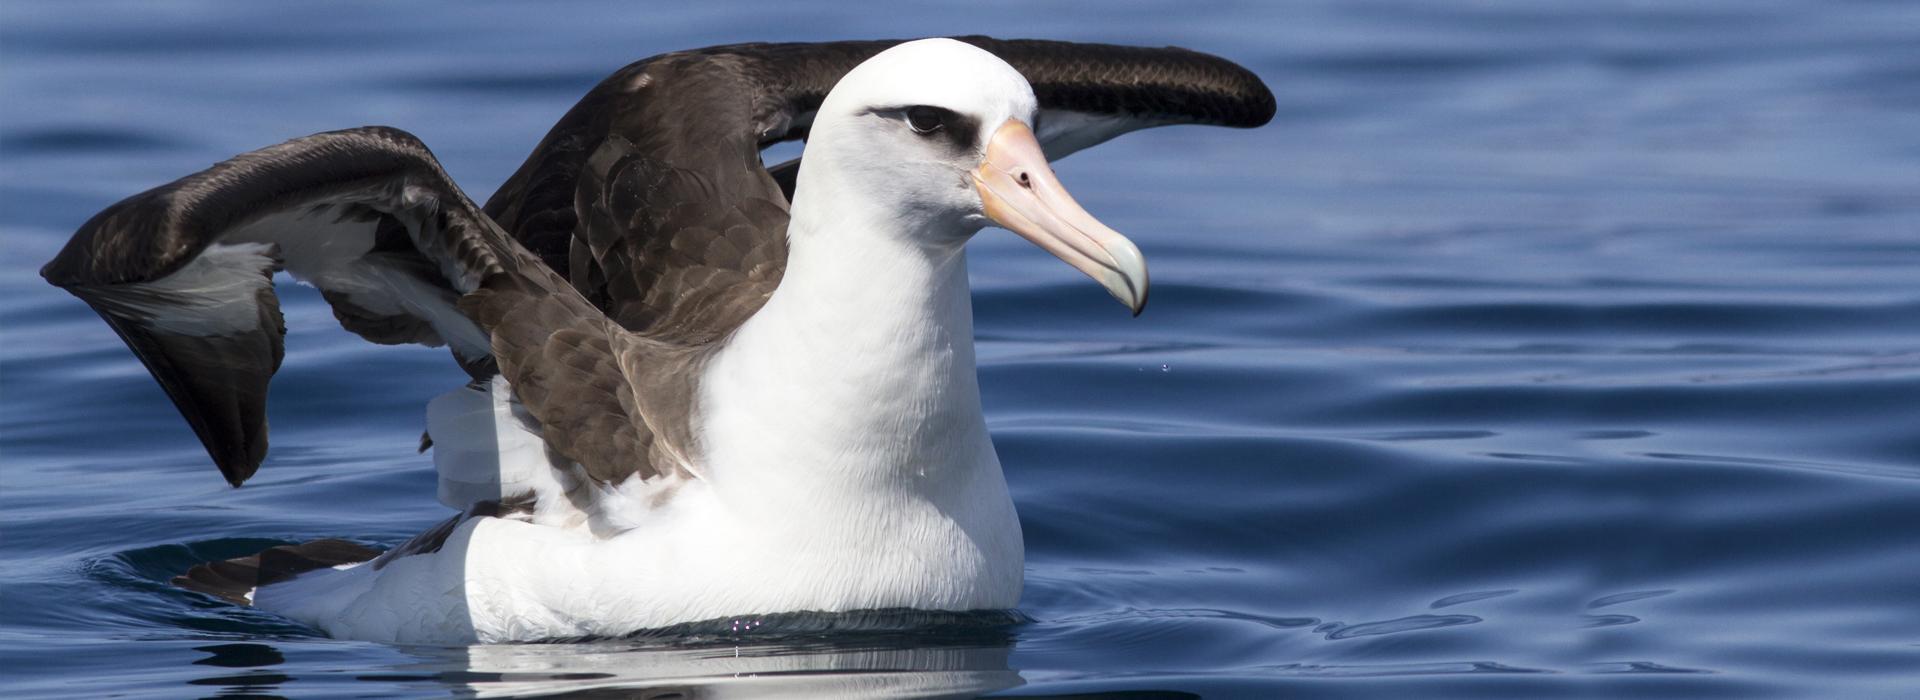 laysan-albatross_dmytro-pylypenko_ss